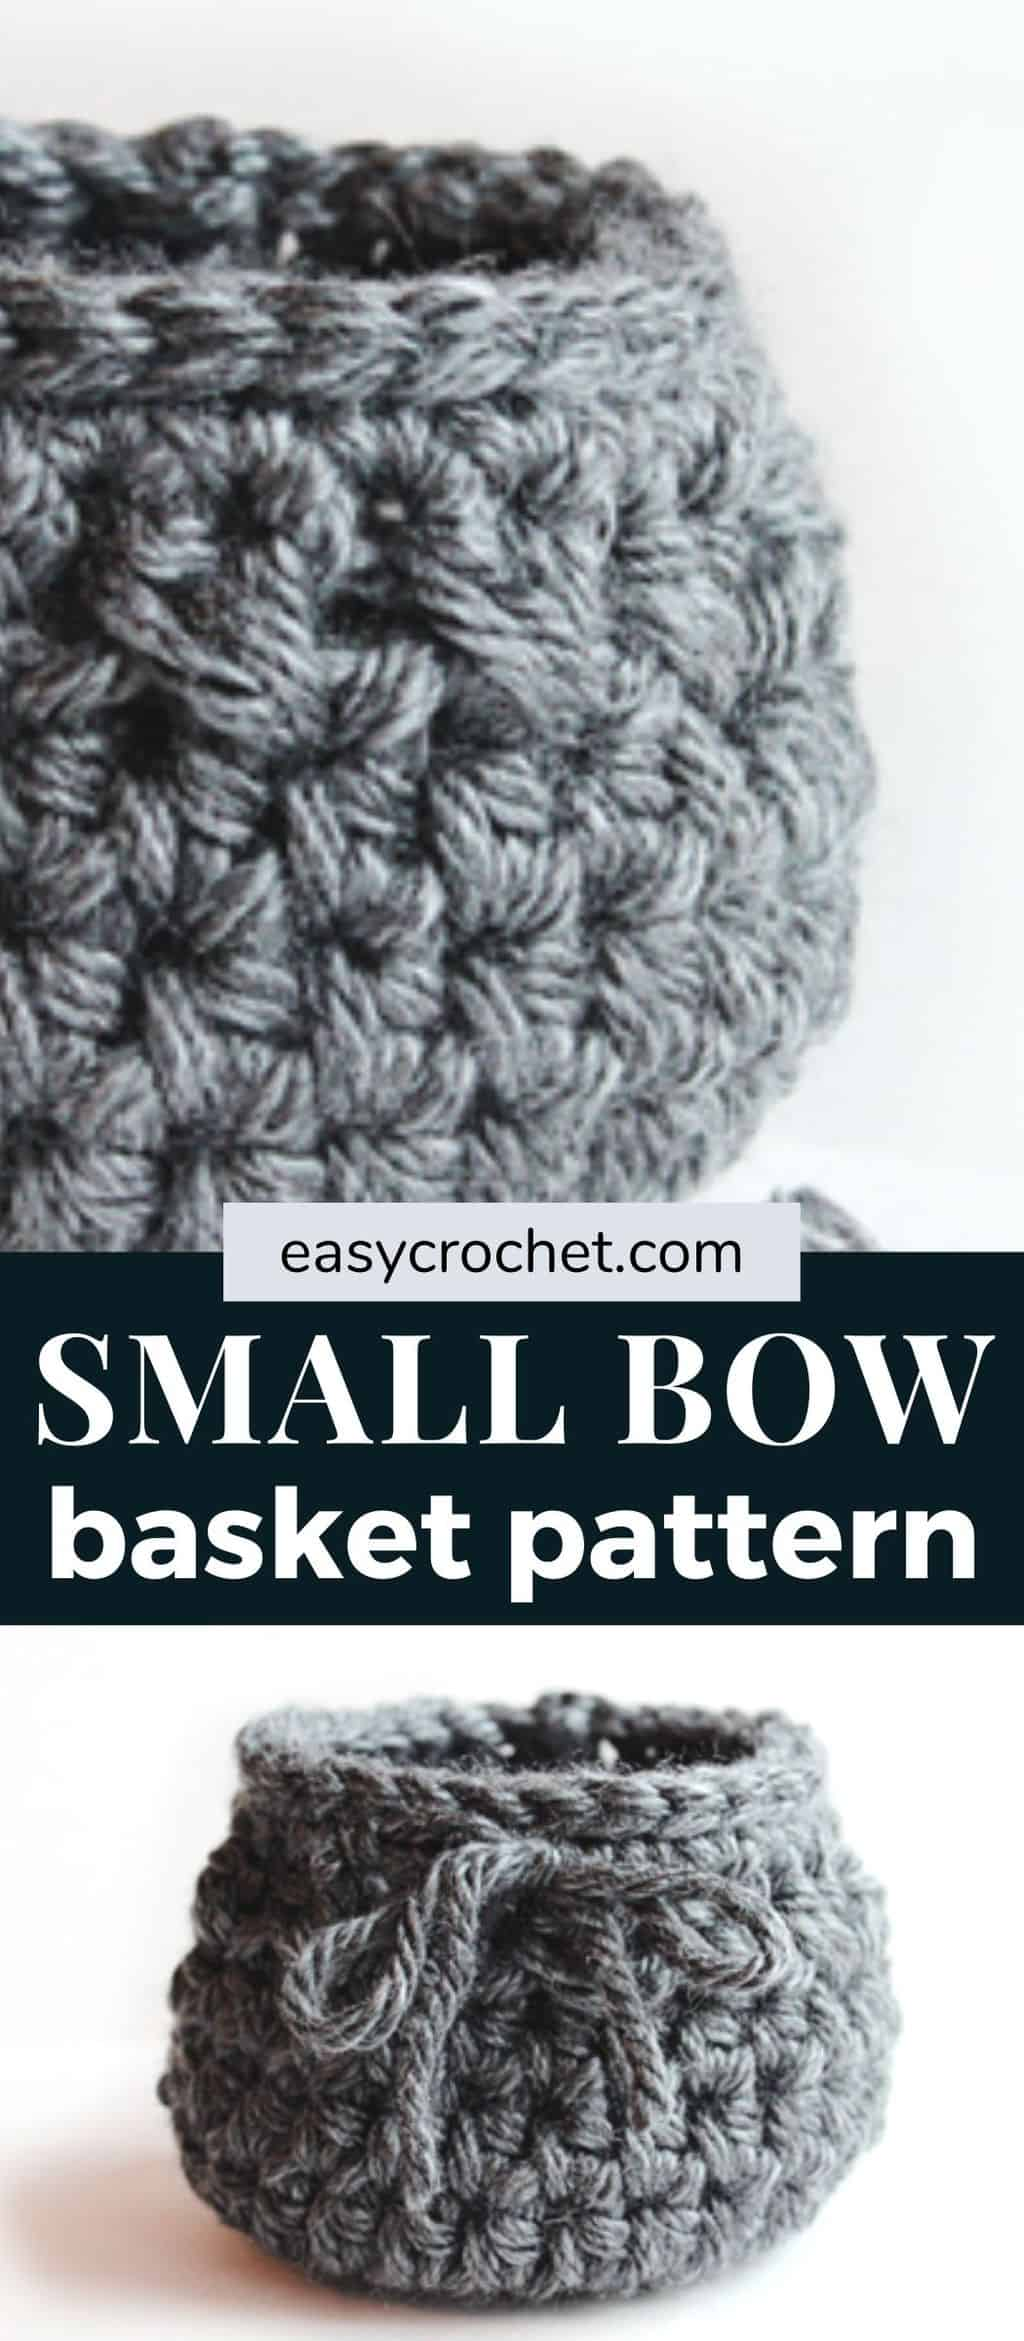 small bow basket crochet pattern